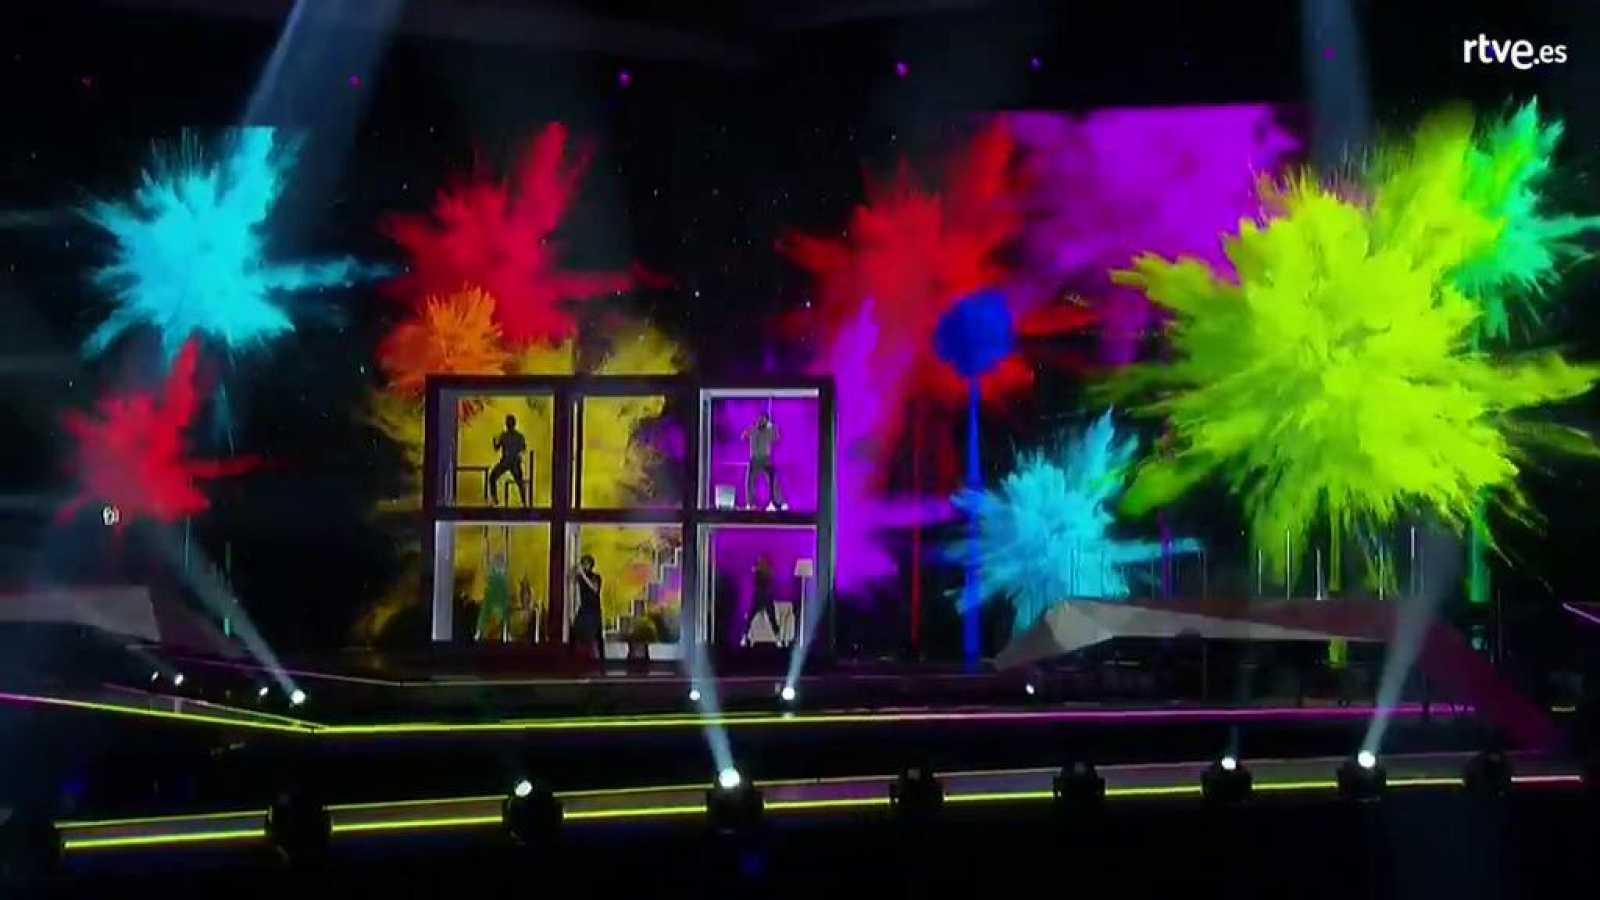 Eurovisión 2019 - Tercer pase de Miki en su primer ensayo en Tel Aviv